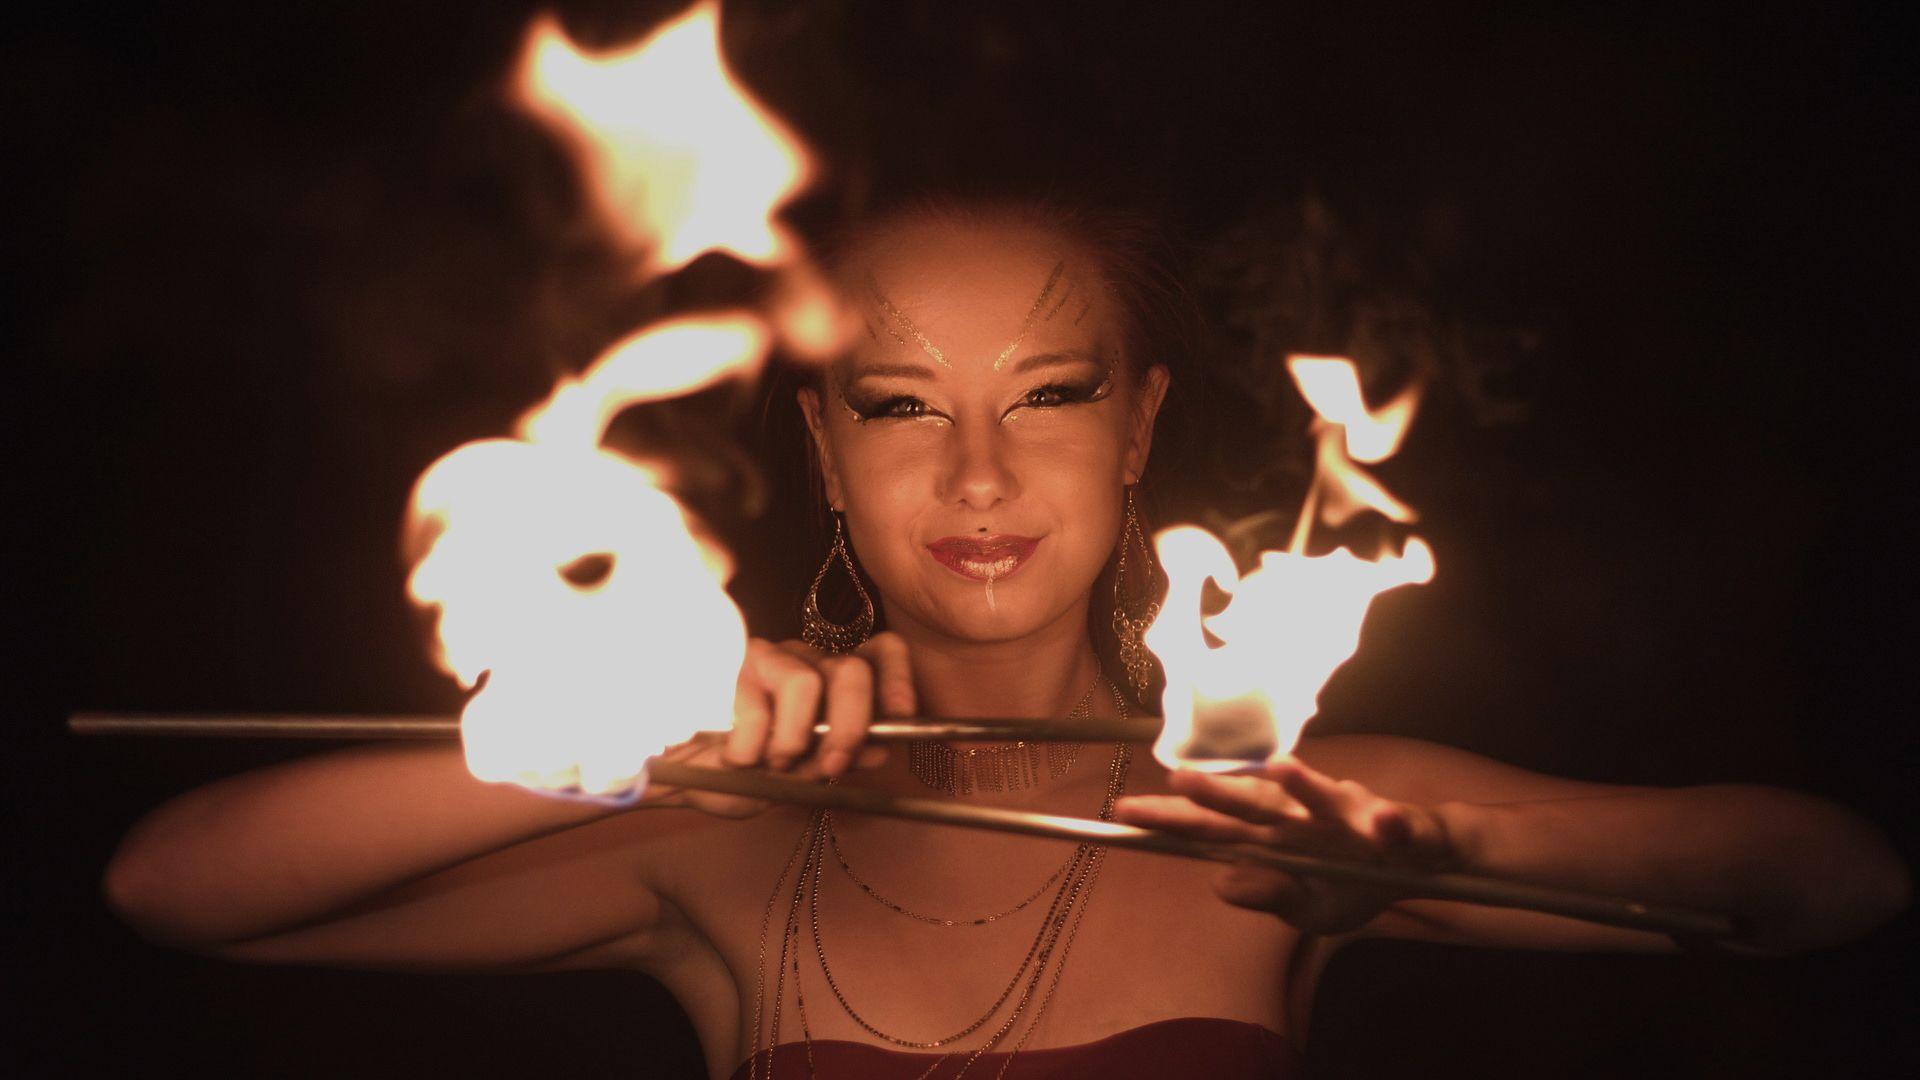 Michaela Fire Performance